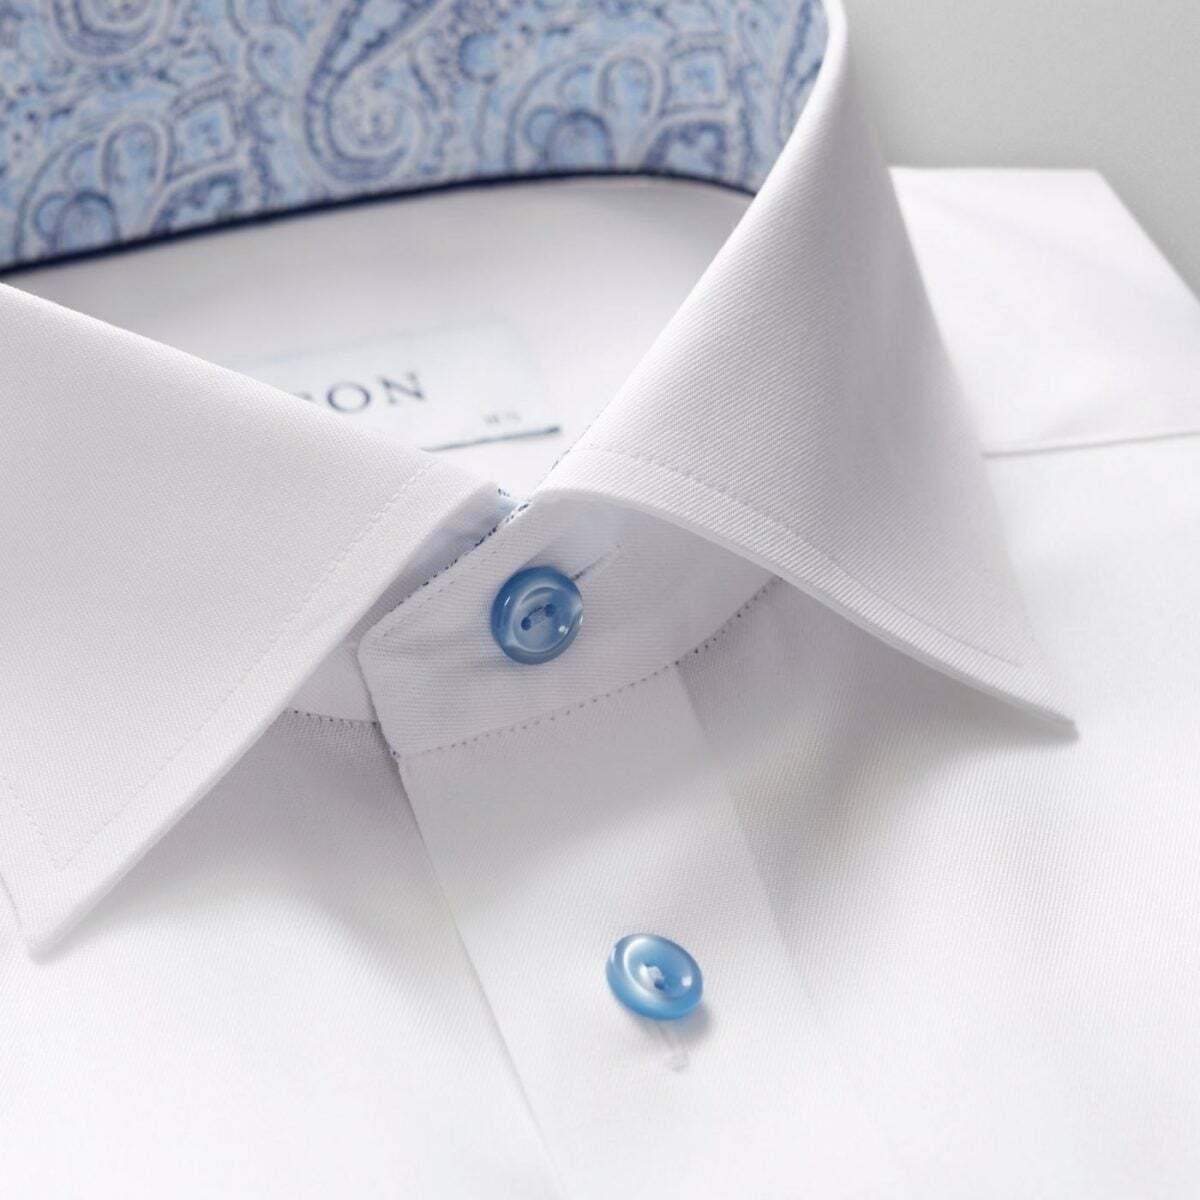 ETON Weiß hemd WITH LIGHT Blau BUTTONS AND TRIM